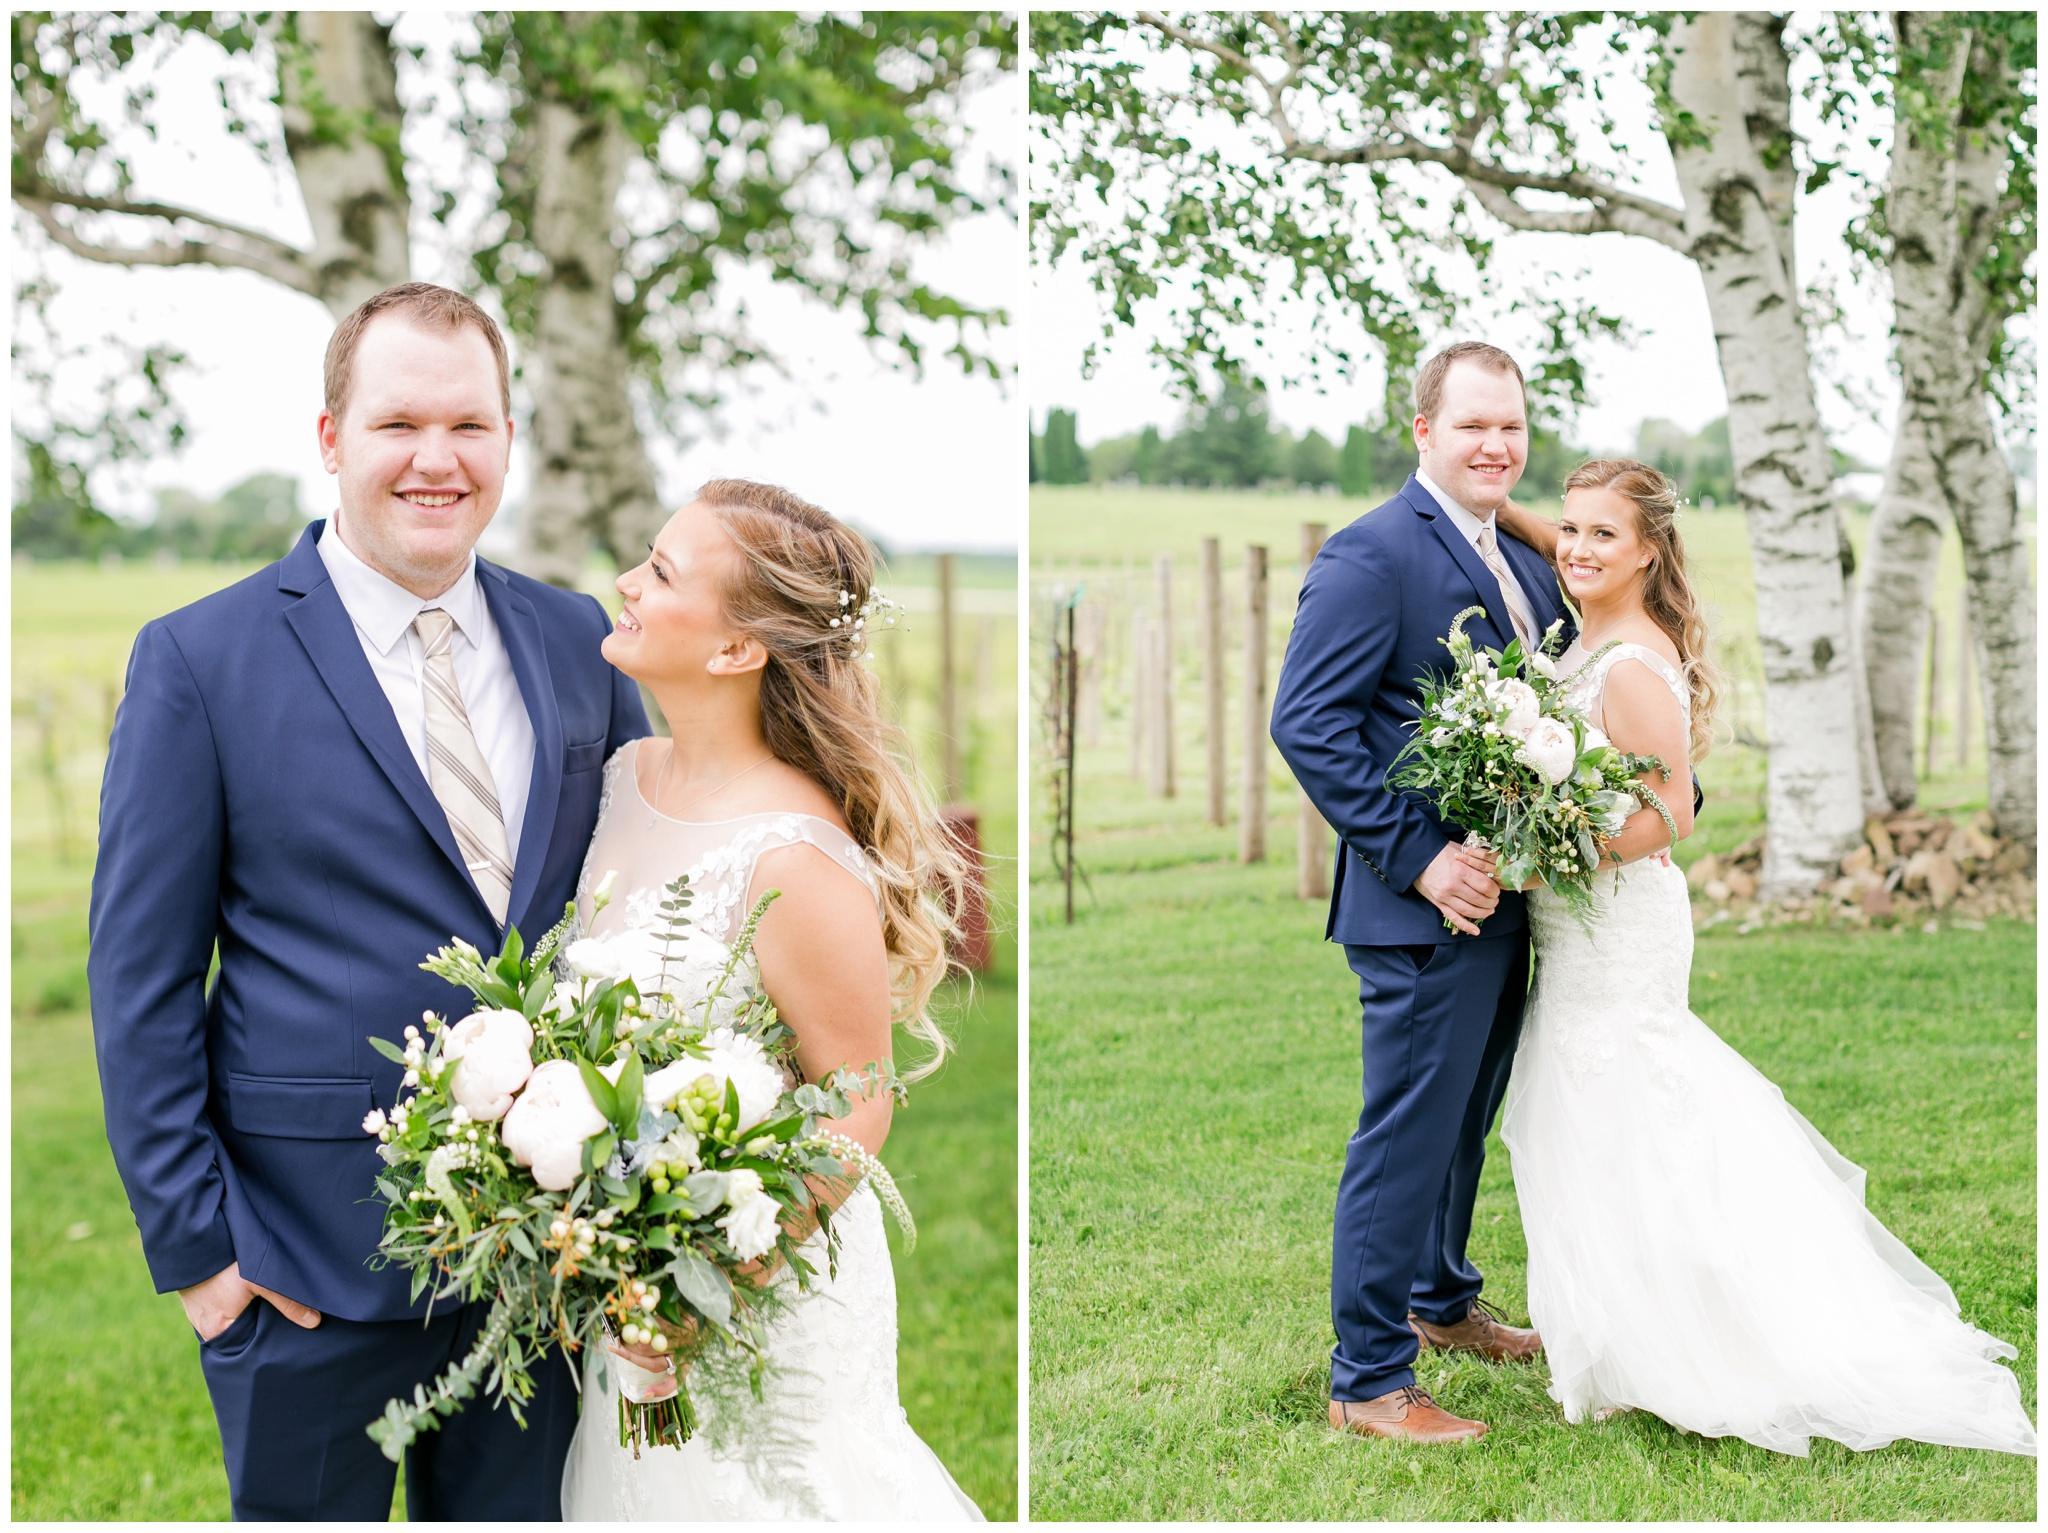 over_the_vines_wedding_edgerton_wisconsin_wedding_caynay_photo_3986.jpg